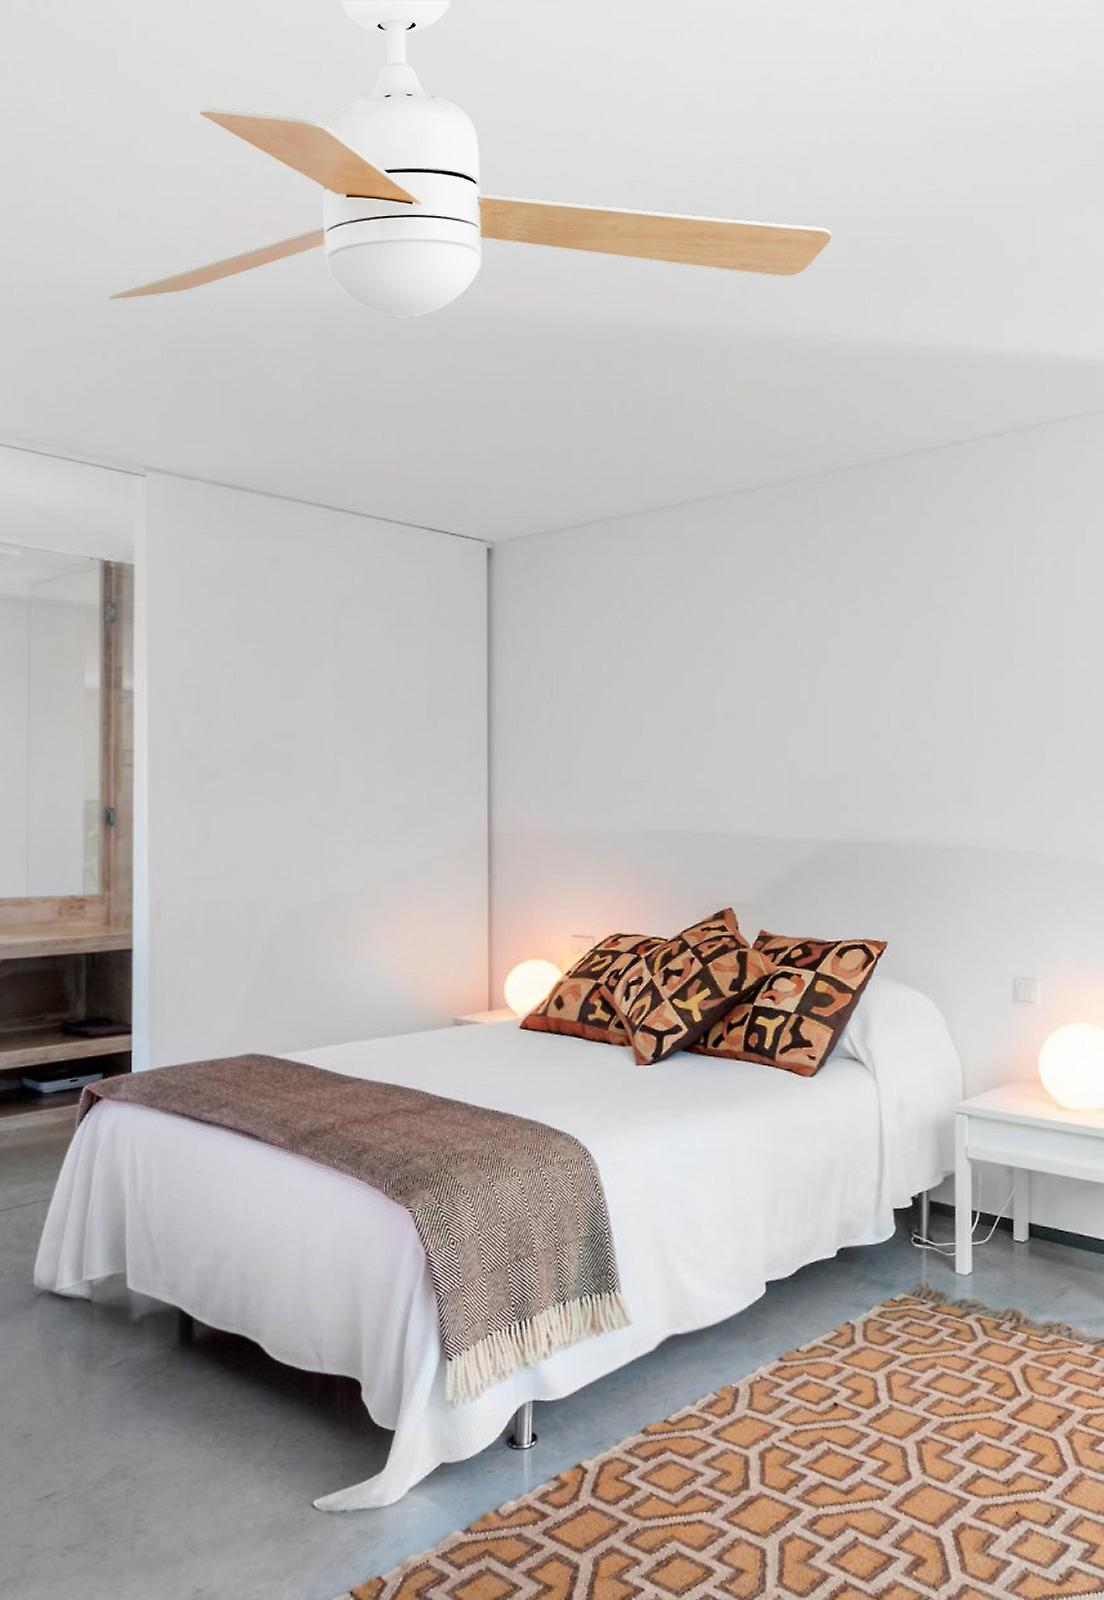 Ceiling fan Cebu White 106cm / 42